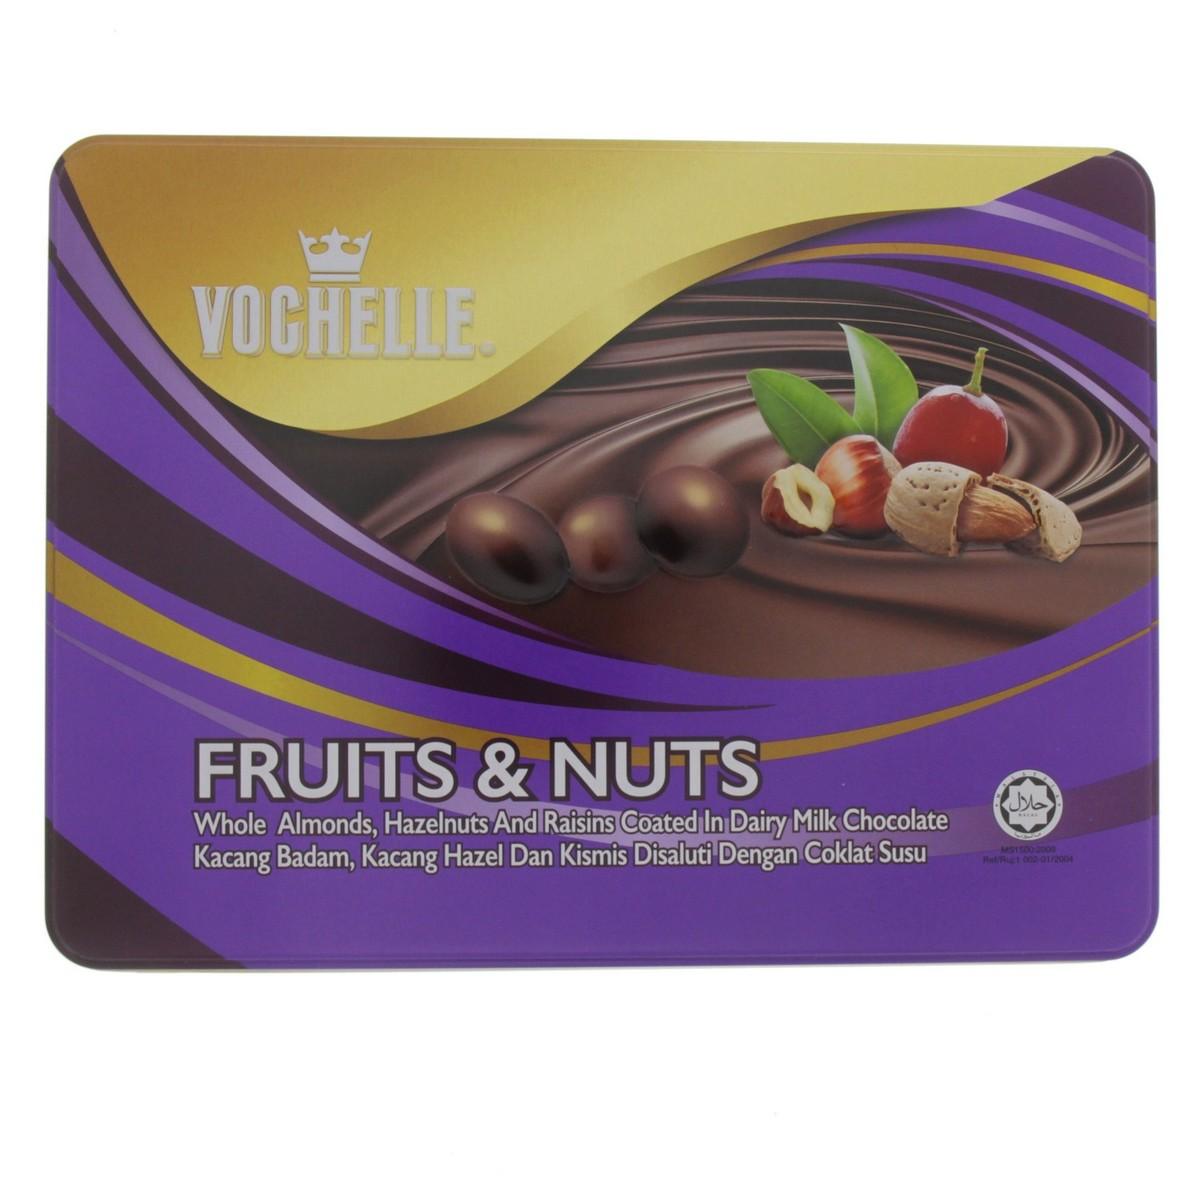 Buy Vochelle Fruit And Nuts 380 Gm Online - Lulu Hypermarket